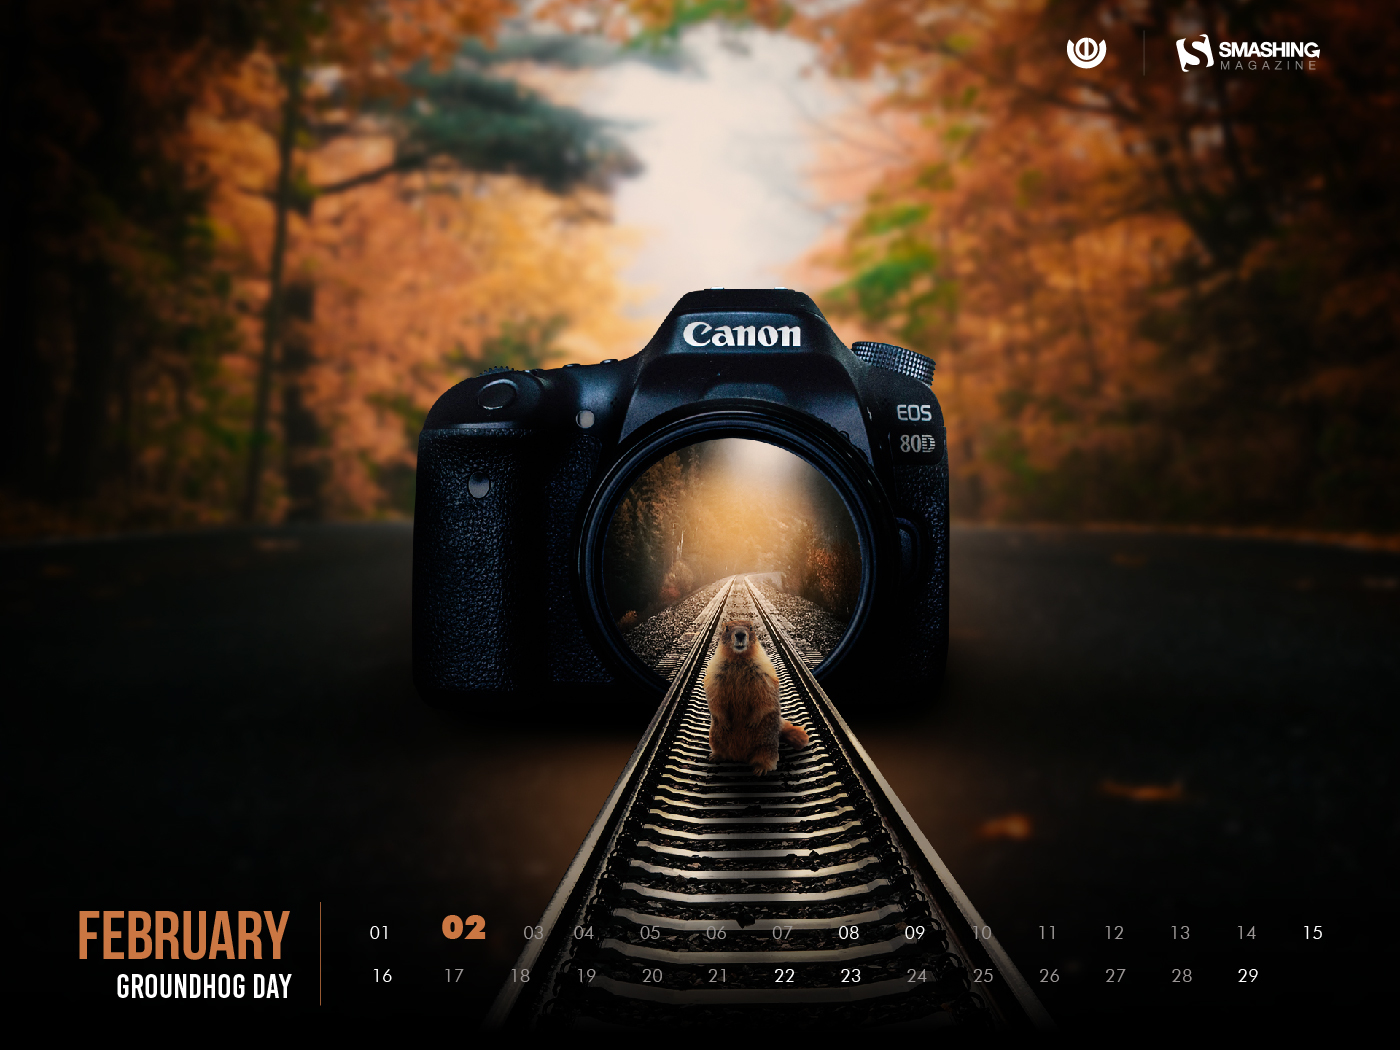 29 Days Of February 2020 Wallpapers Edition Smashing Magazine 1400x1050